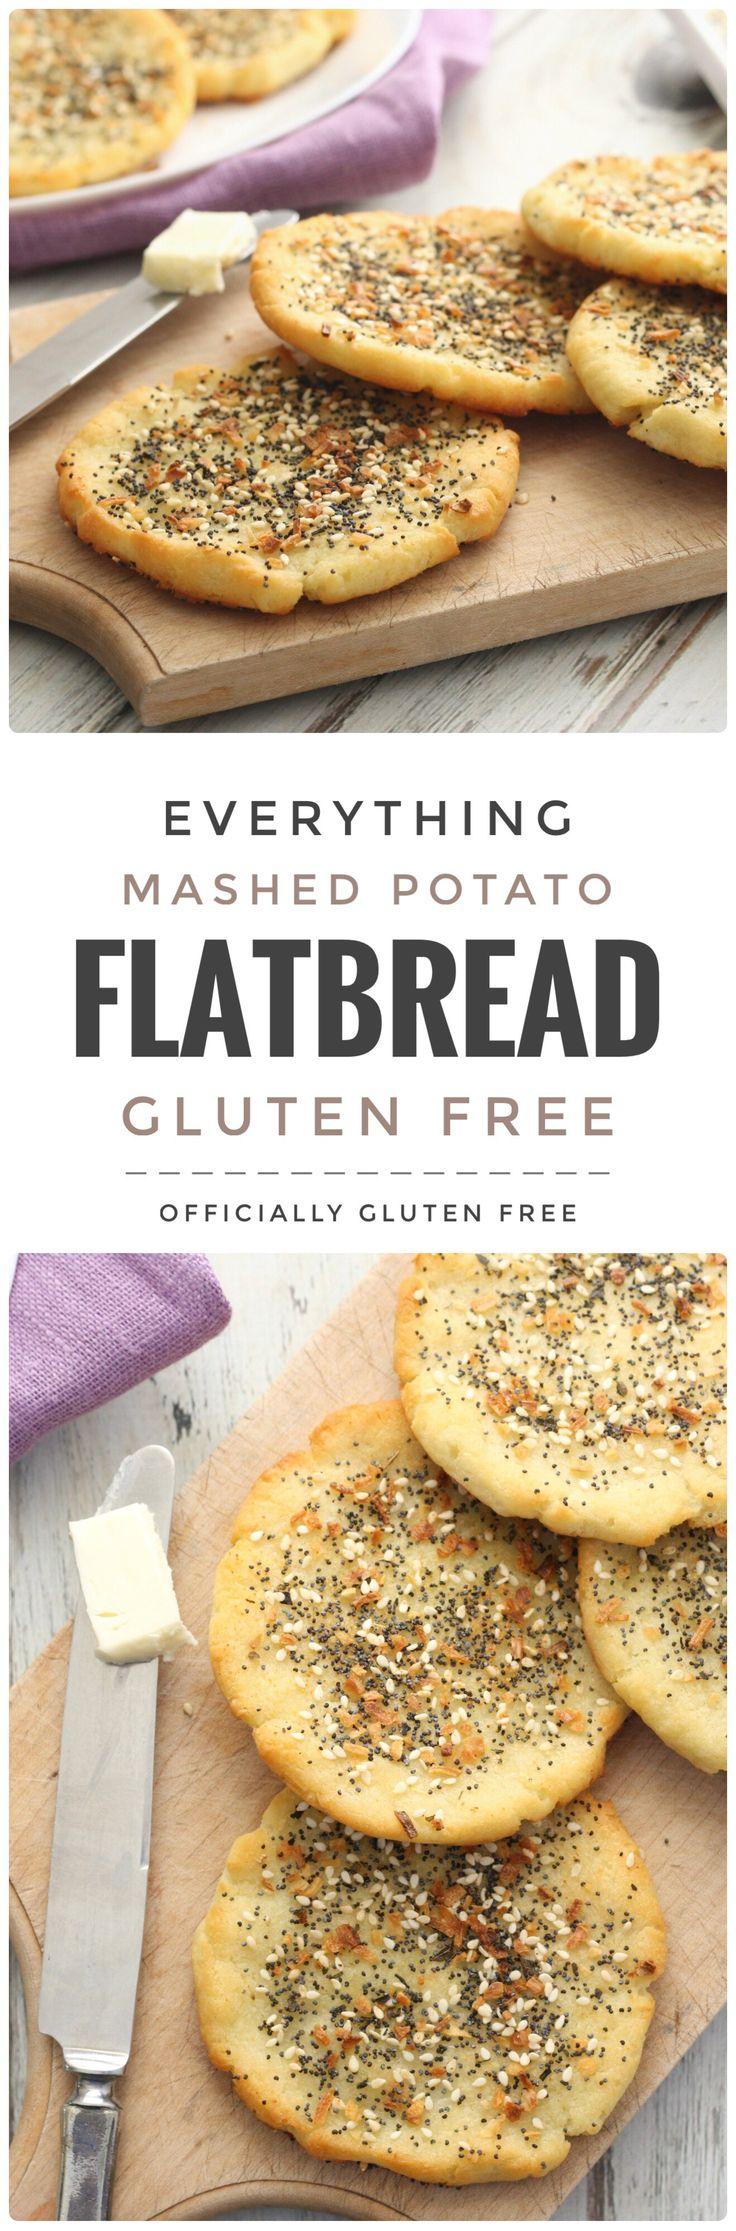 Gluten Free Everything Mashed Potato Flatbread